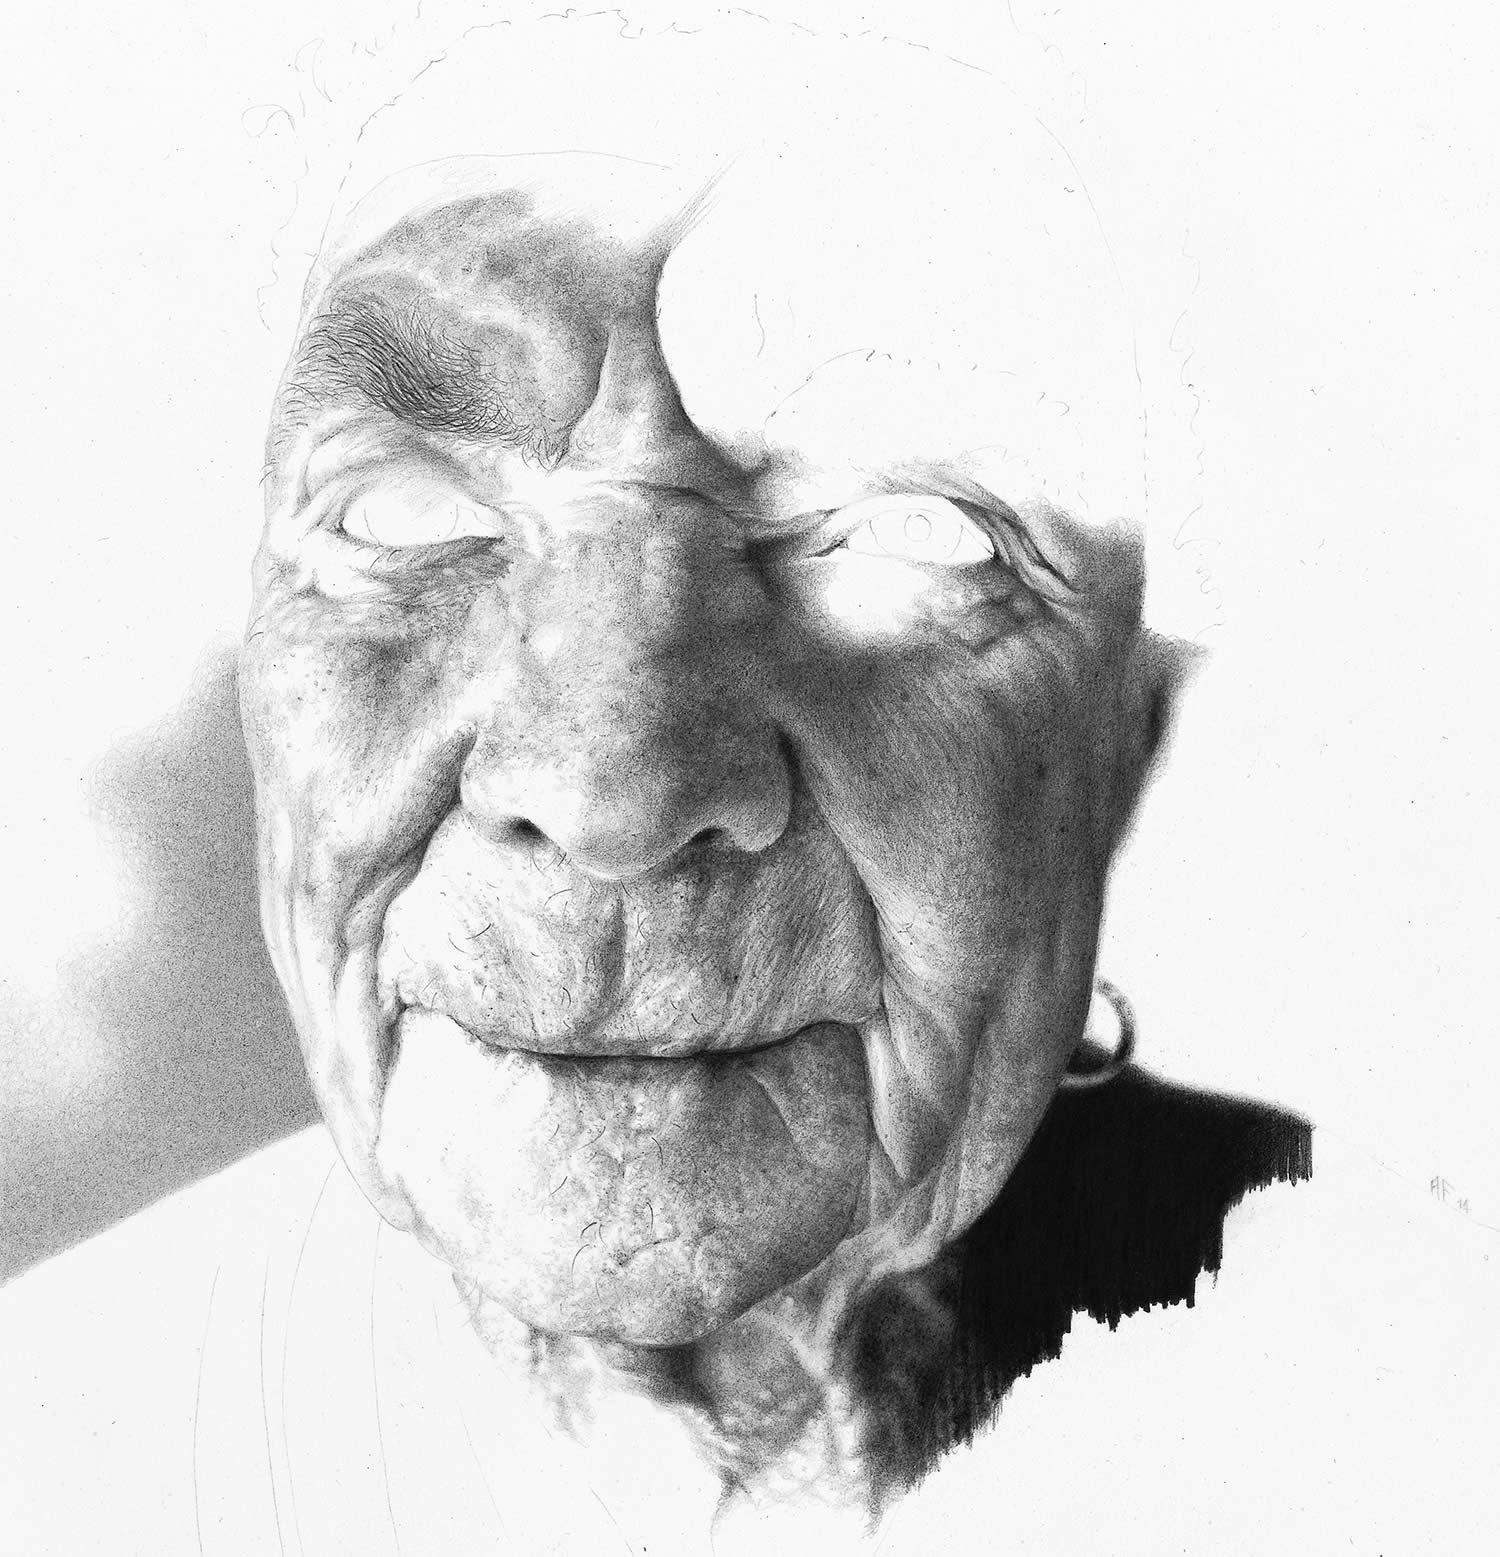 wip portrait by antonio finelli